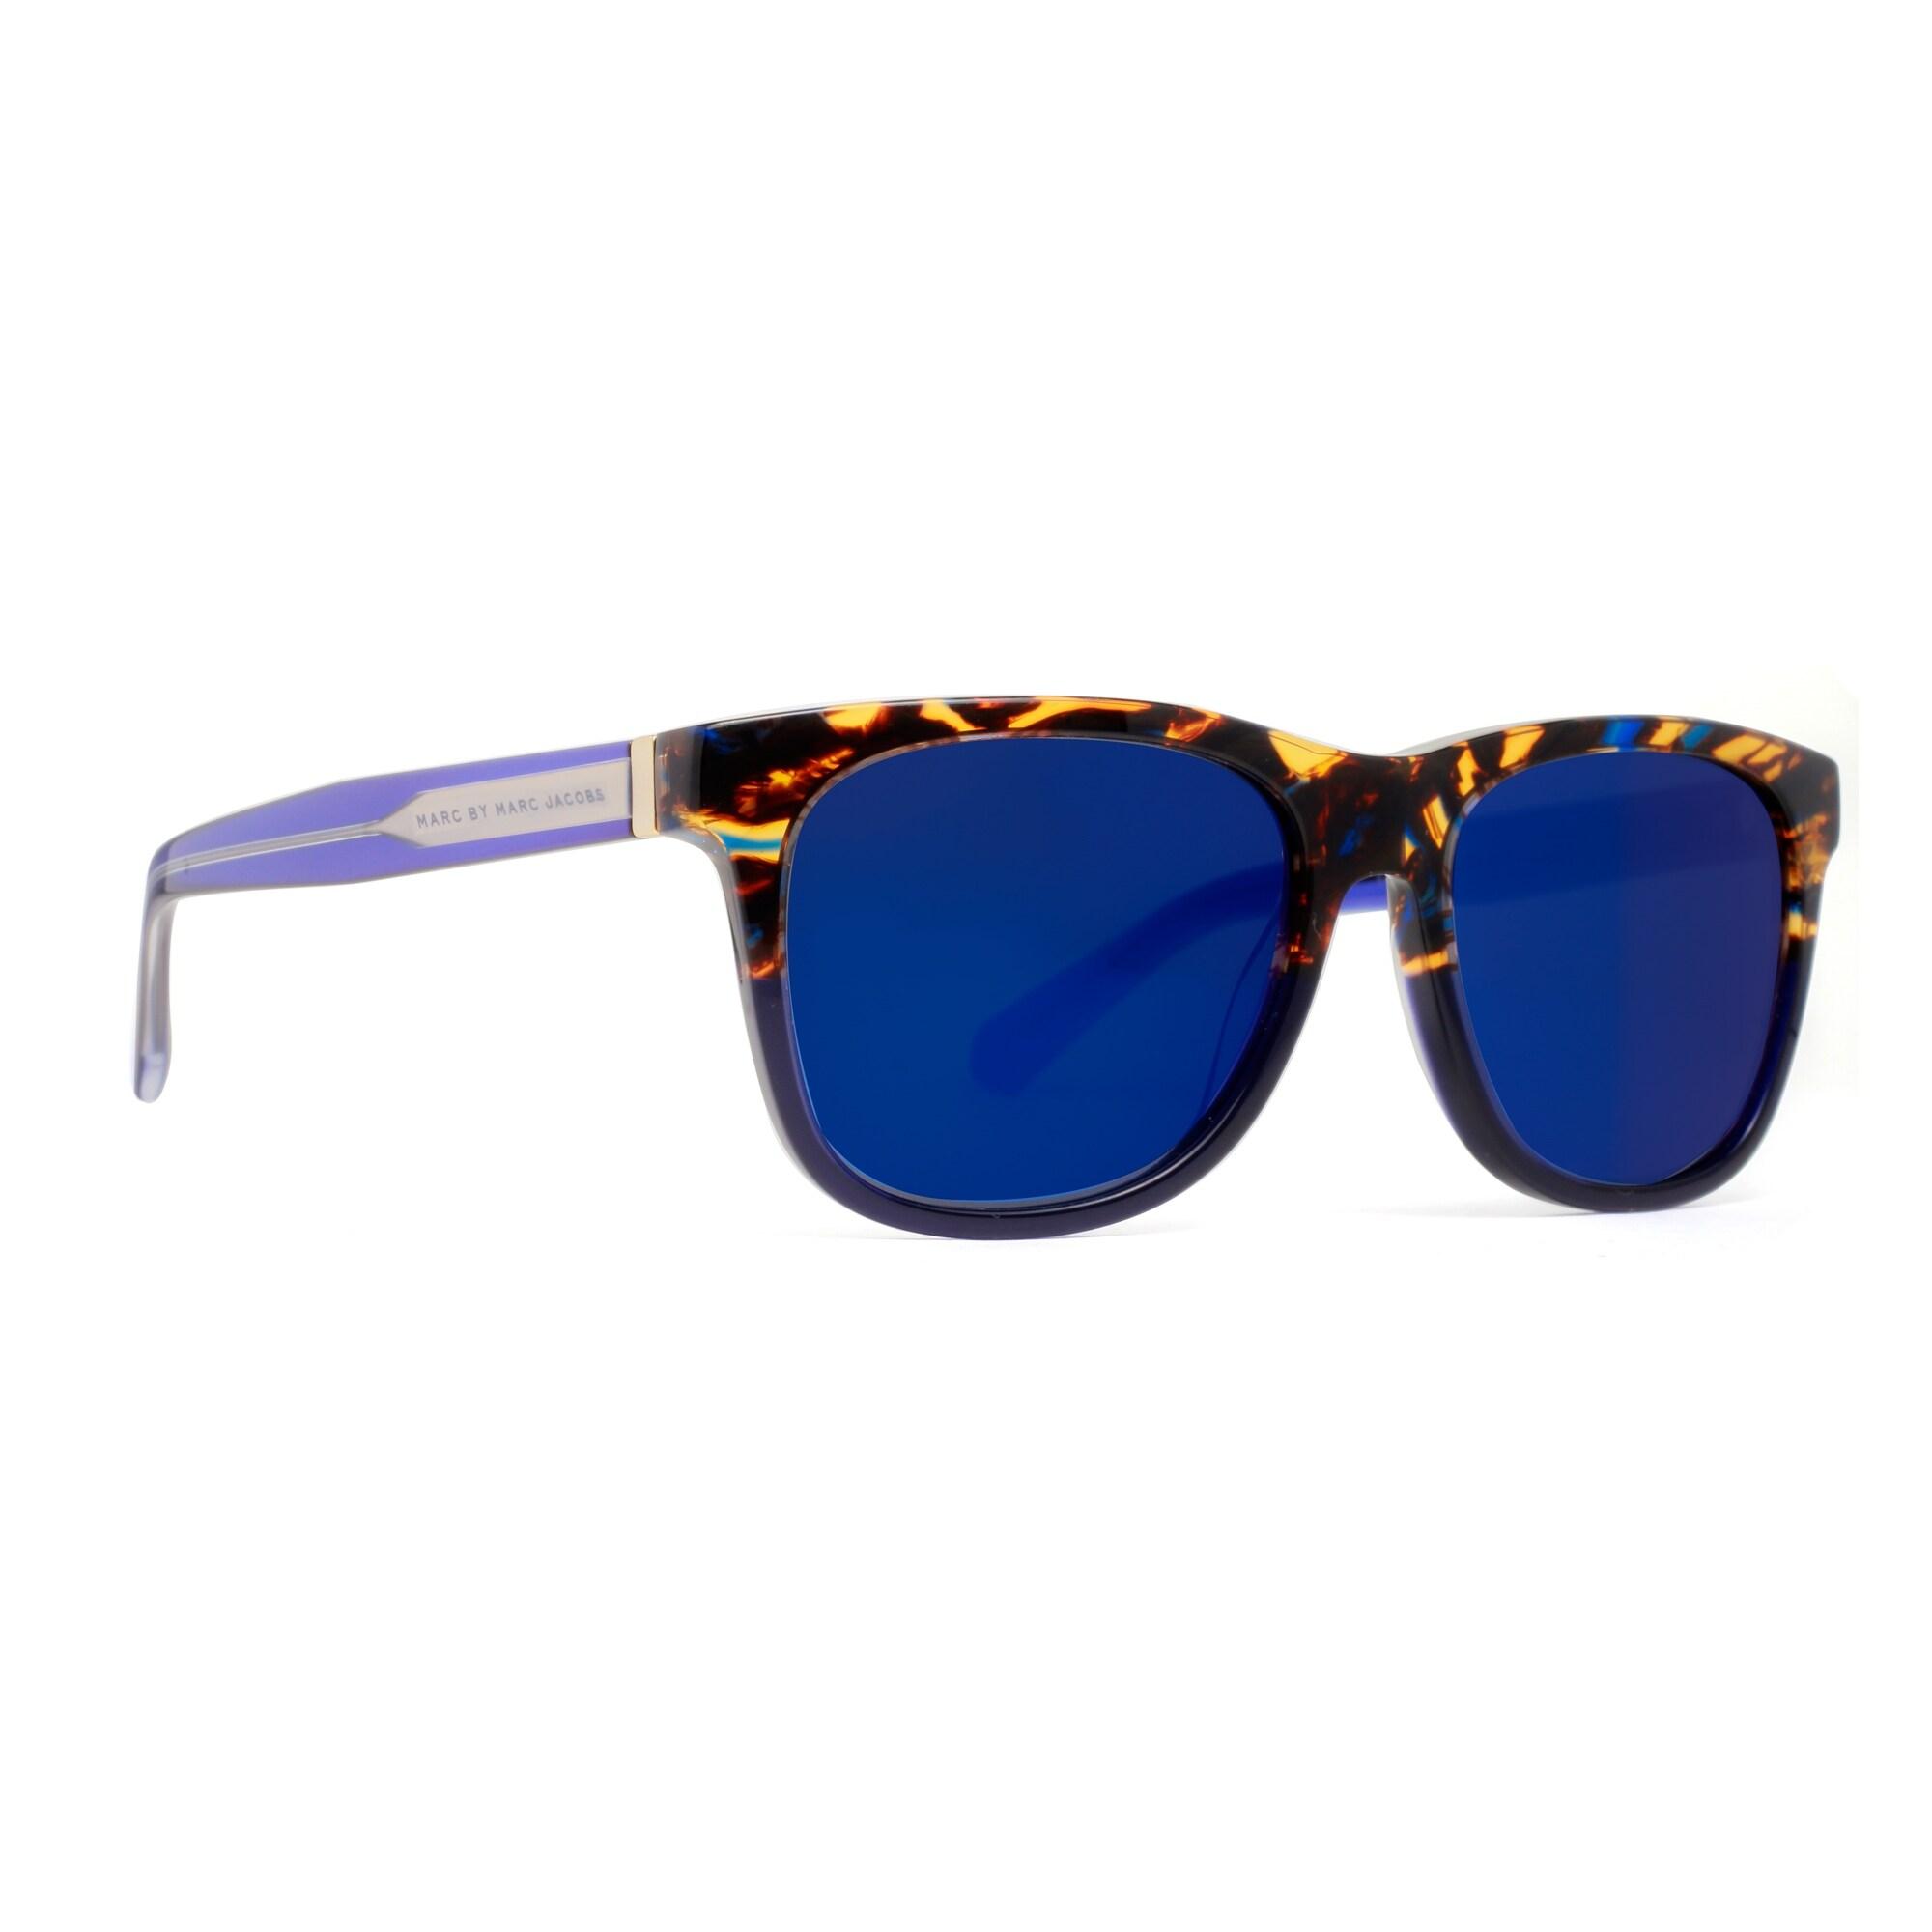 b1cf7dbe19a9 Shop Marc by Marc Jacobs MMJ 360/N/S LJX 1G Havana Brown/Blue Mirrored  Sunglasses - Havana Brown - 54mm-17mm-140mm - Free Shipping Today -  Overstock - ...